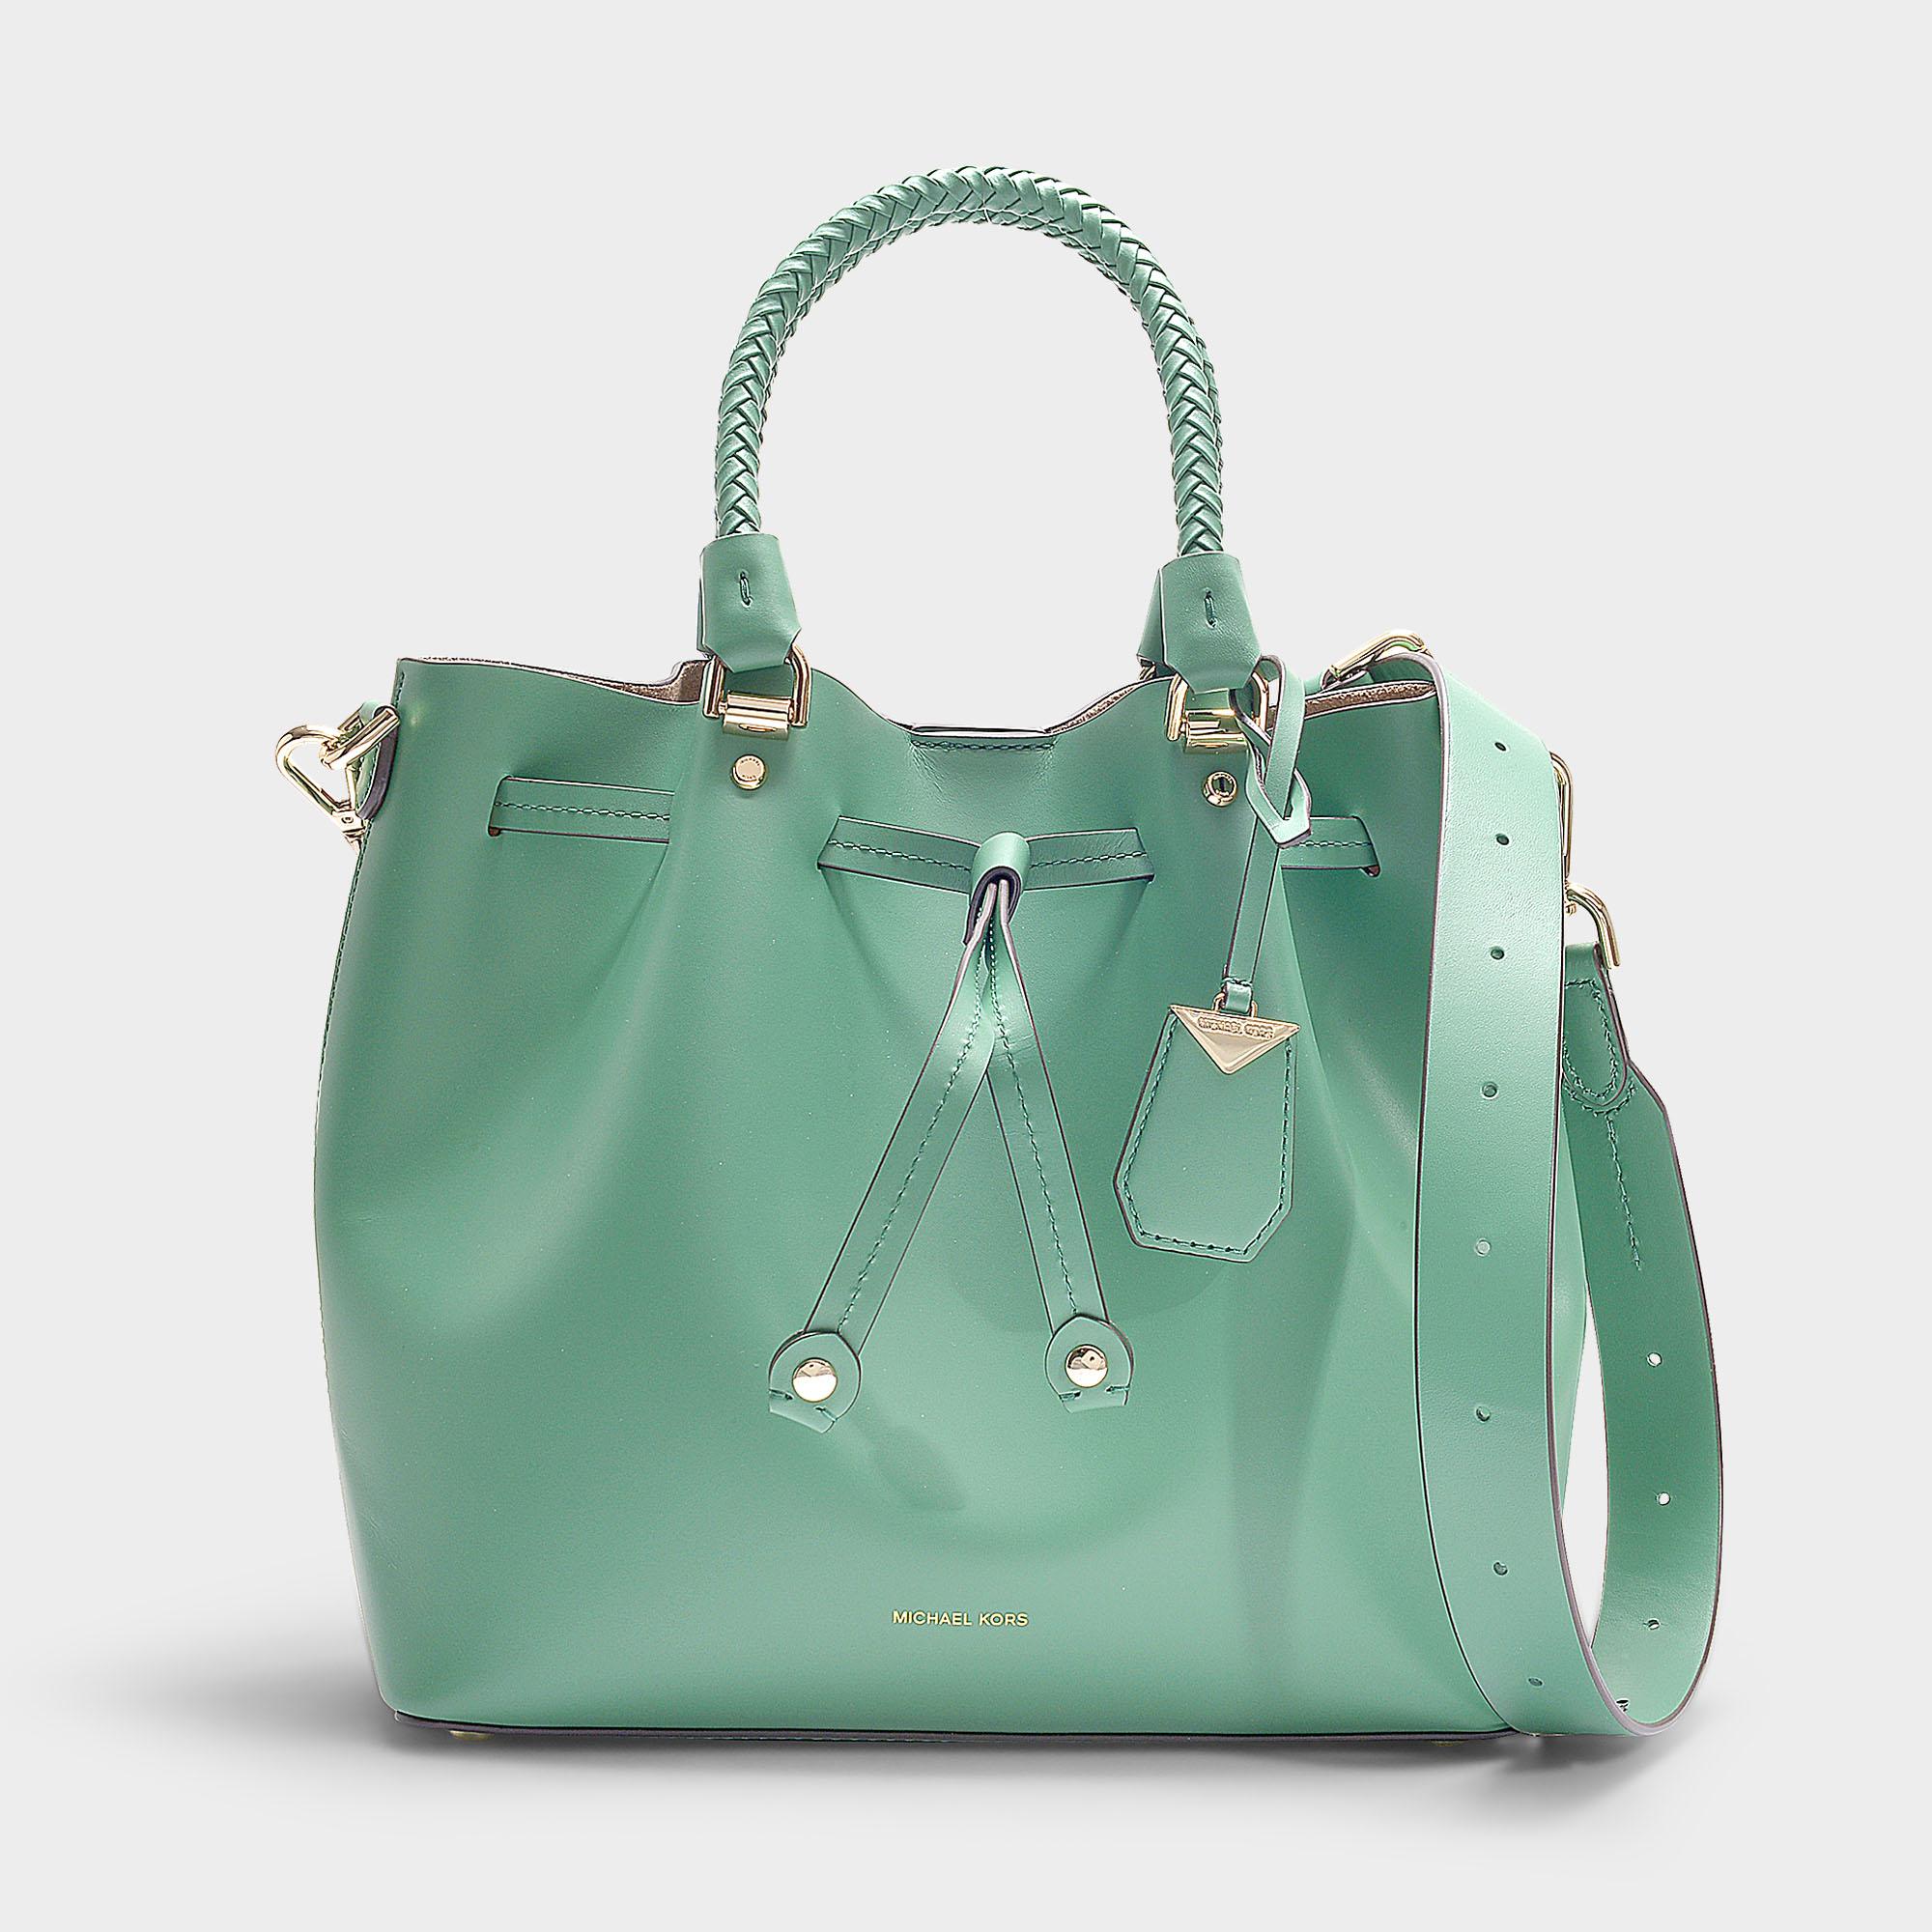 3687203df9e5 Michael Michael Kors | Blakely Medium Bucket Bag In Black Calfskin In Green